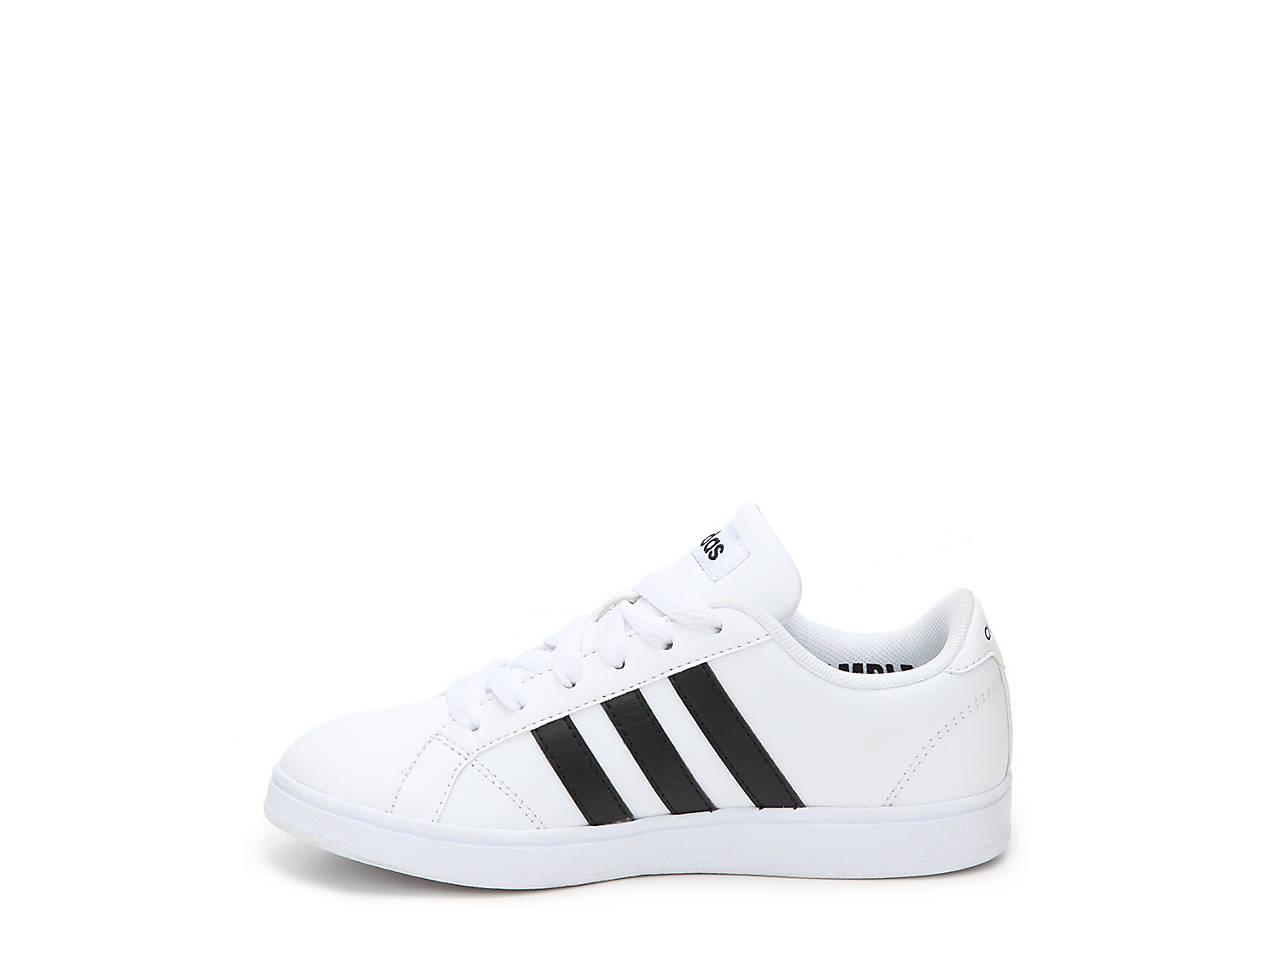 innovative design 0779a b9b2b previous. Baseline Toddler  Youth Sneaker